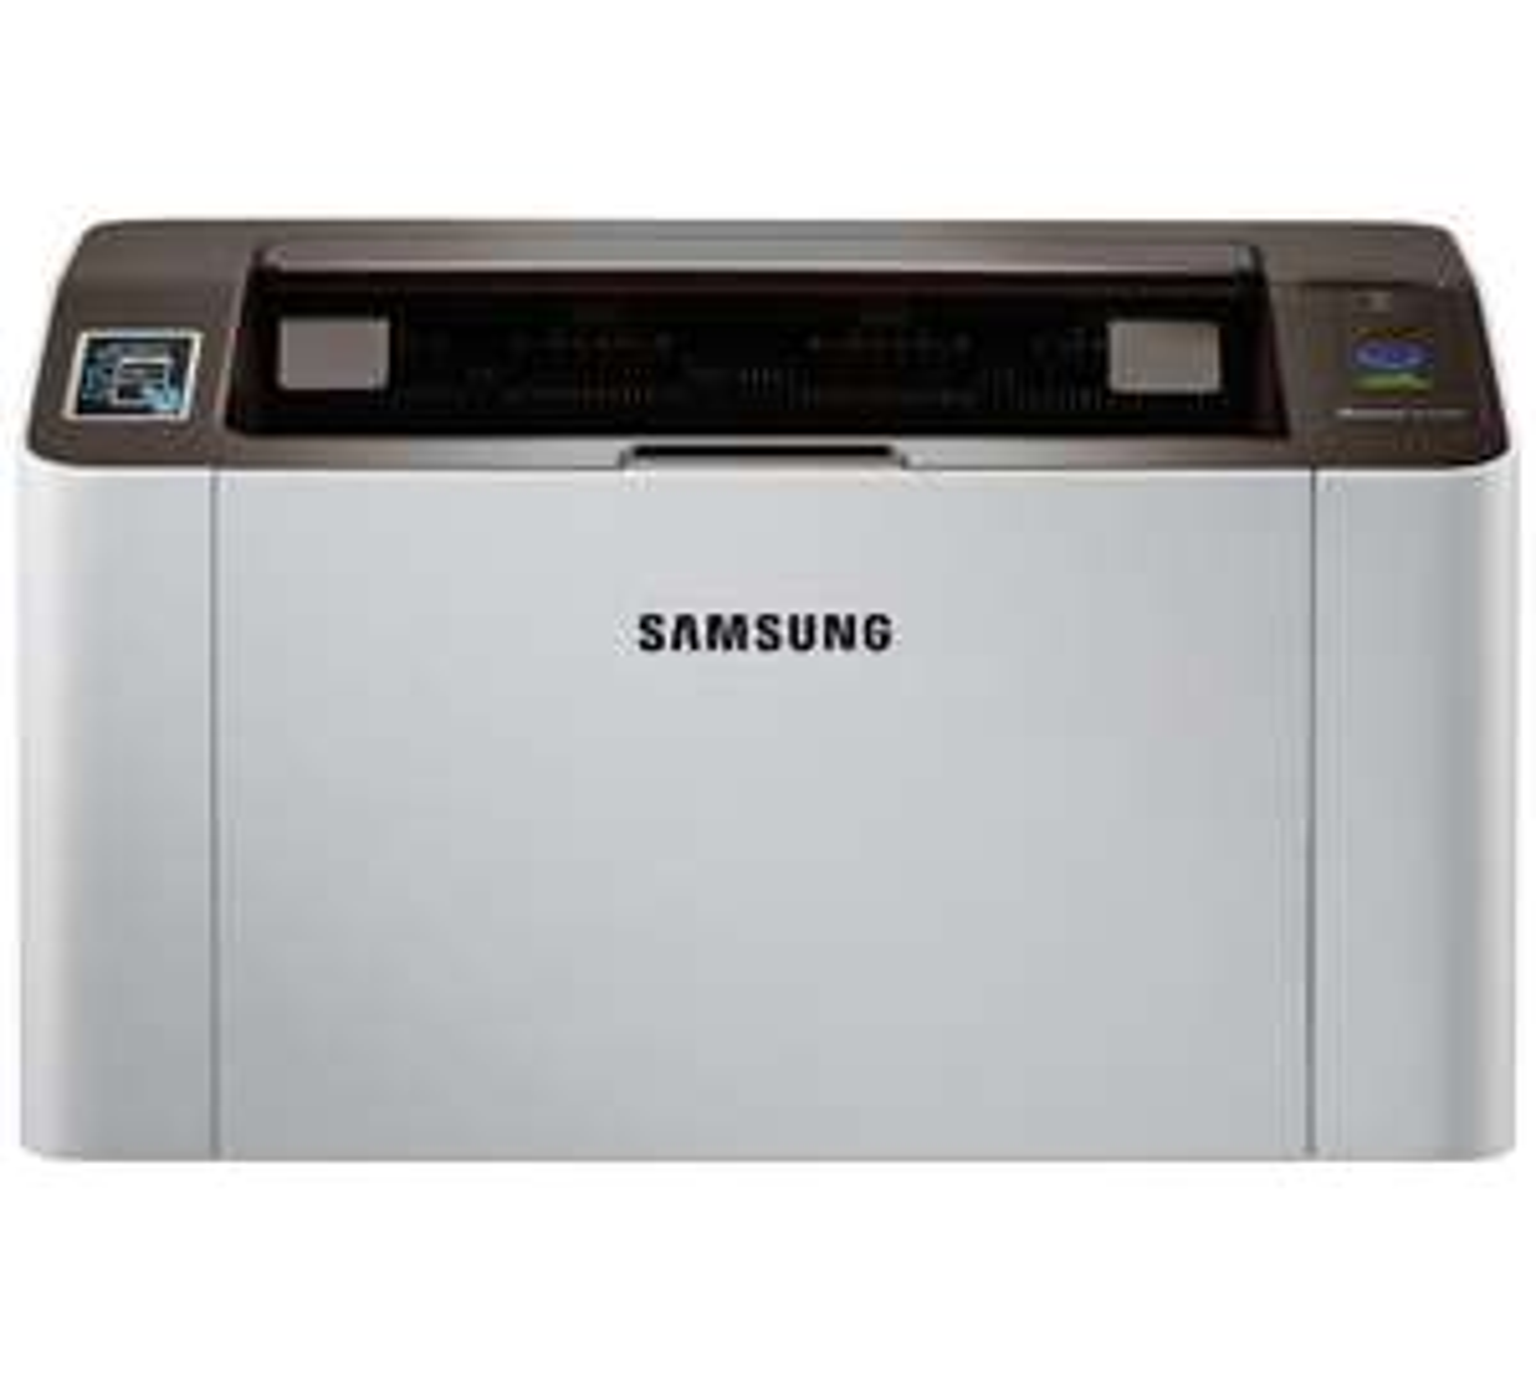 Samsung M2026 wireless mono laser printer £39.99 Argos/Currys/John Lewis